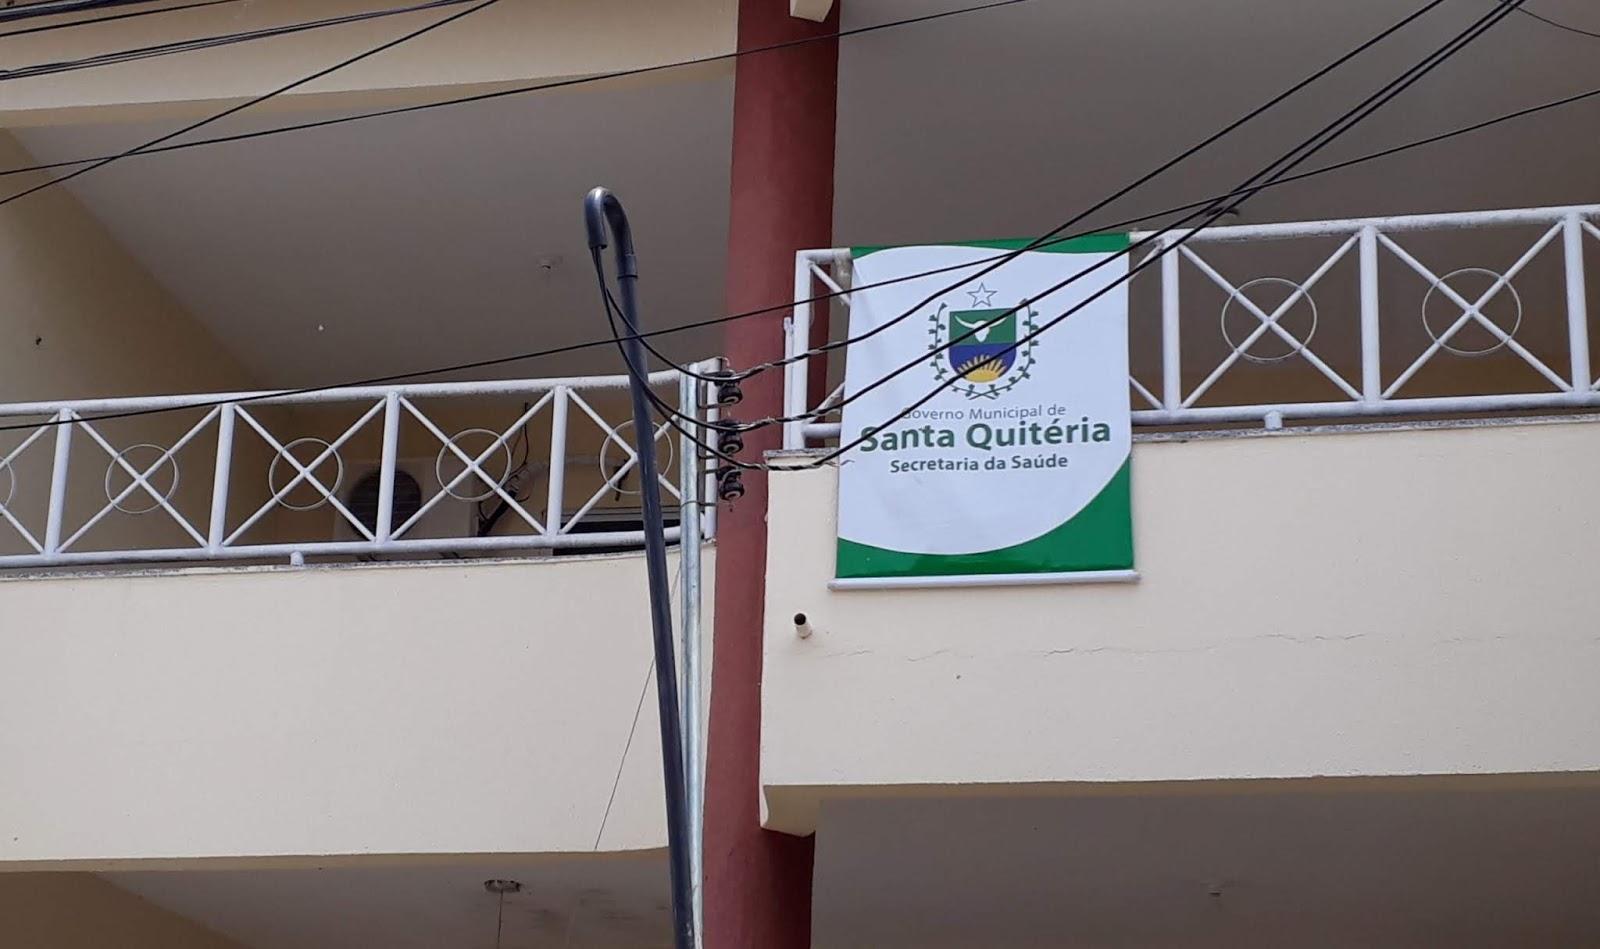 Santa Quitéria prepara plano de contingência contra coronavírus; grande fluxo de pessoas exige alerta